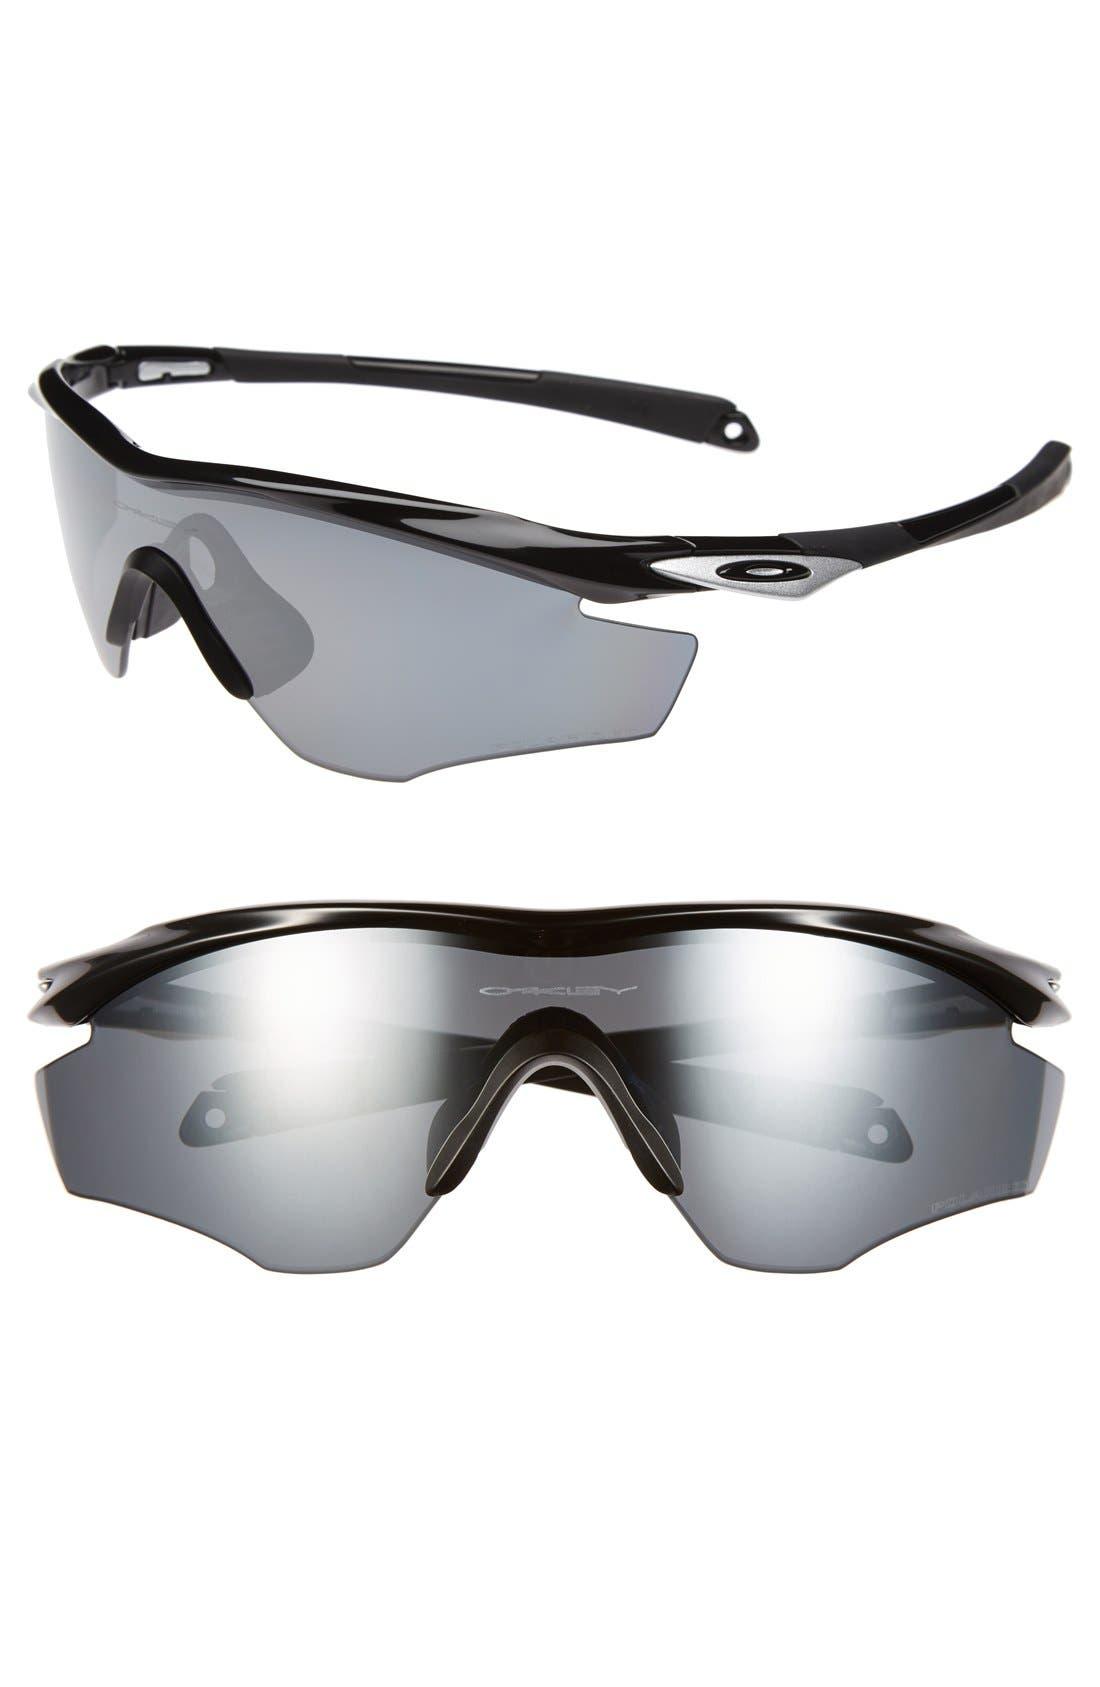 Alternate Image 1 Selected - Oakley 'M2 Frame' 175mm Polarized Shield Sunglasses